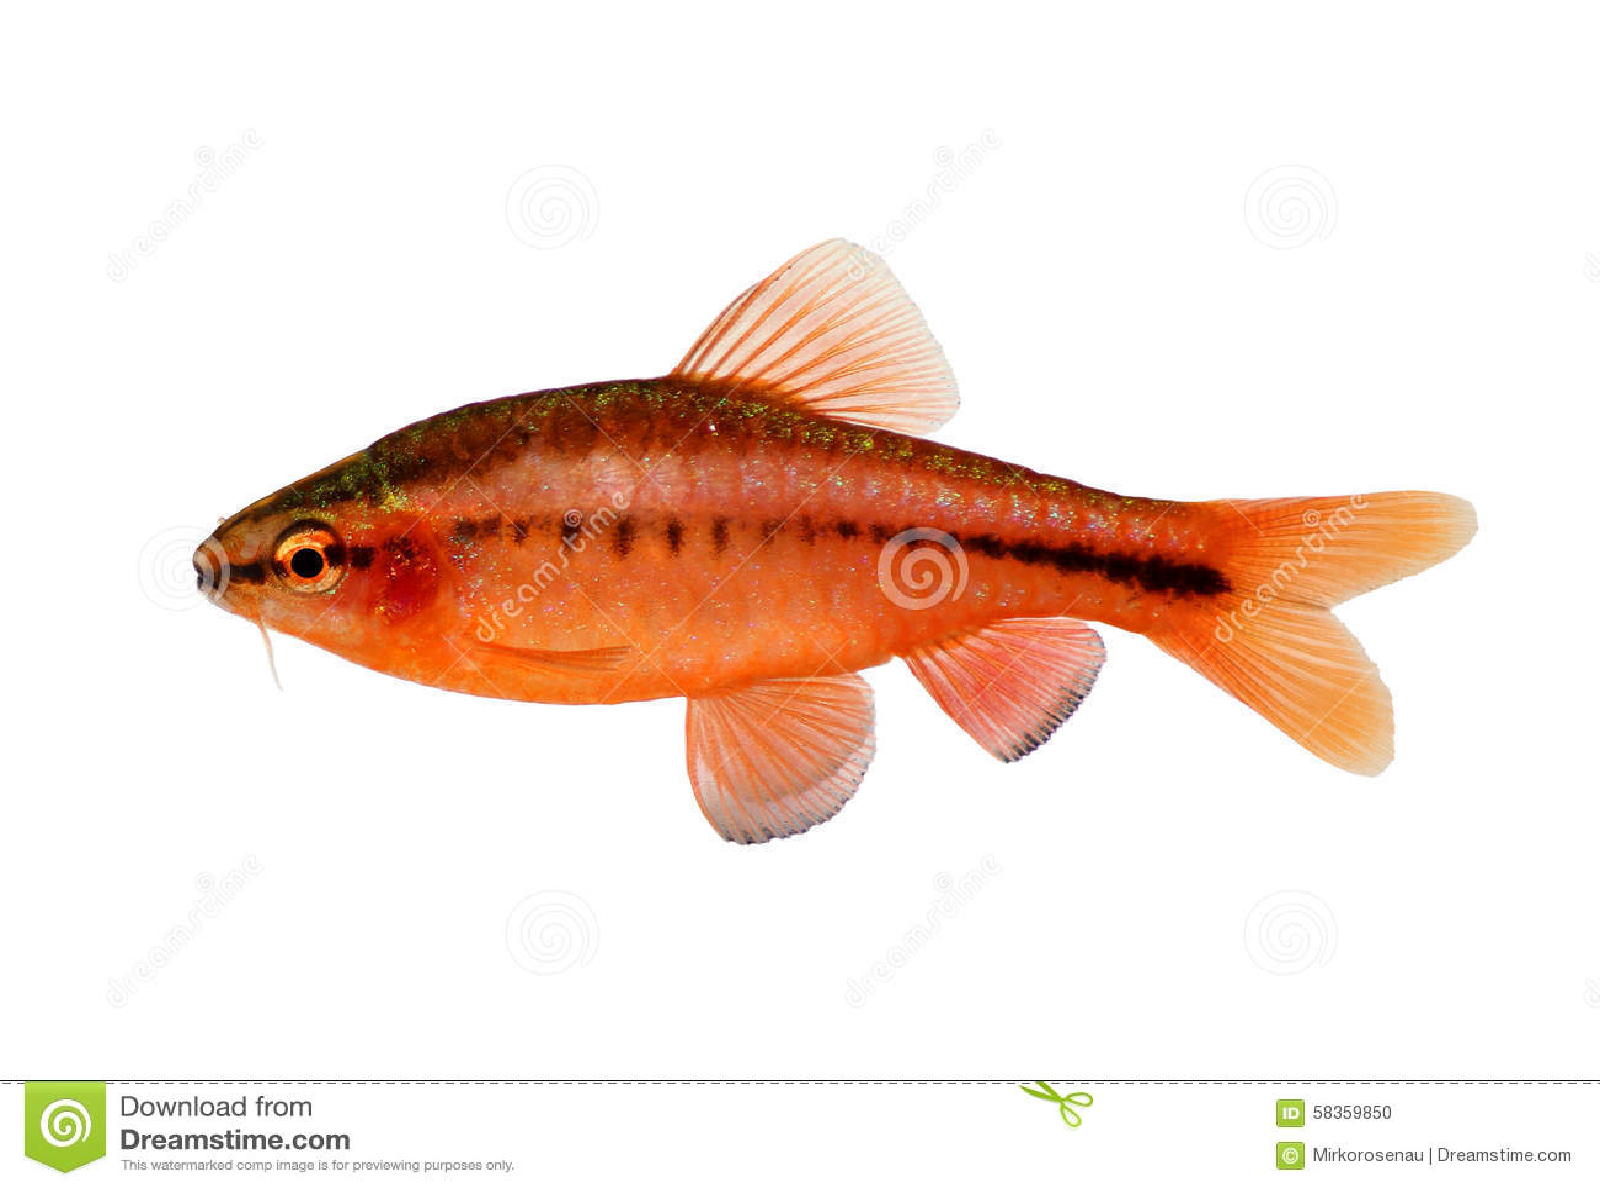 Aquarium fish cherry barb puntius titteya freshwater for Cherry barb fish